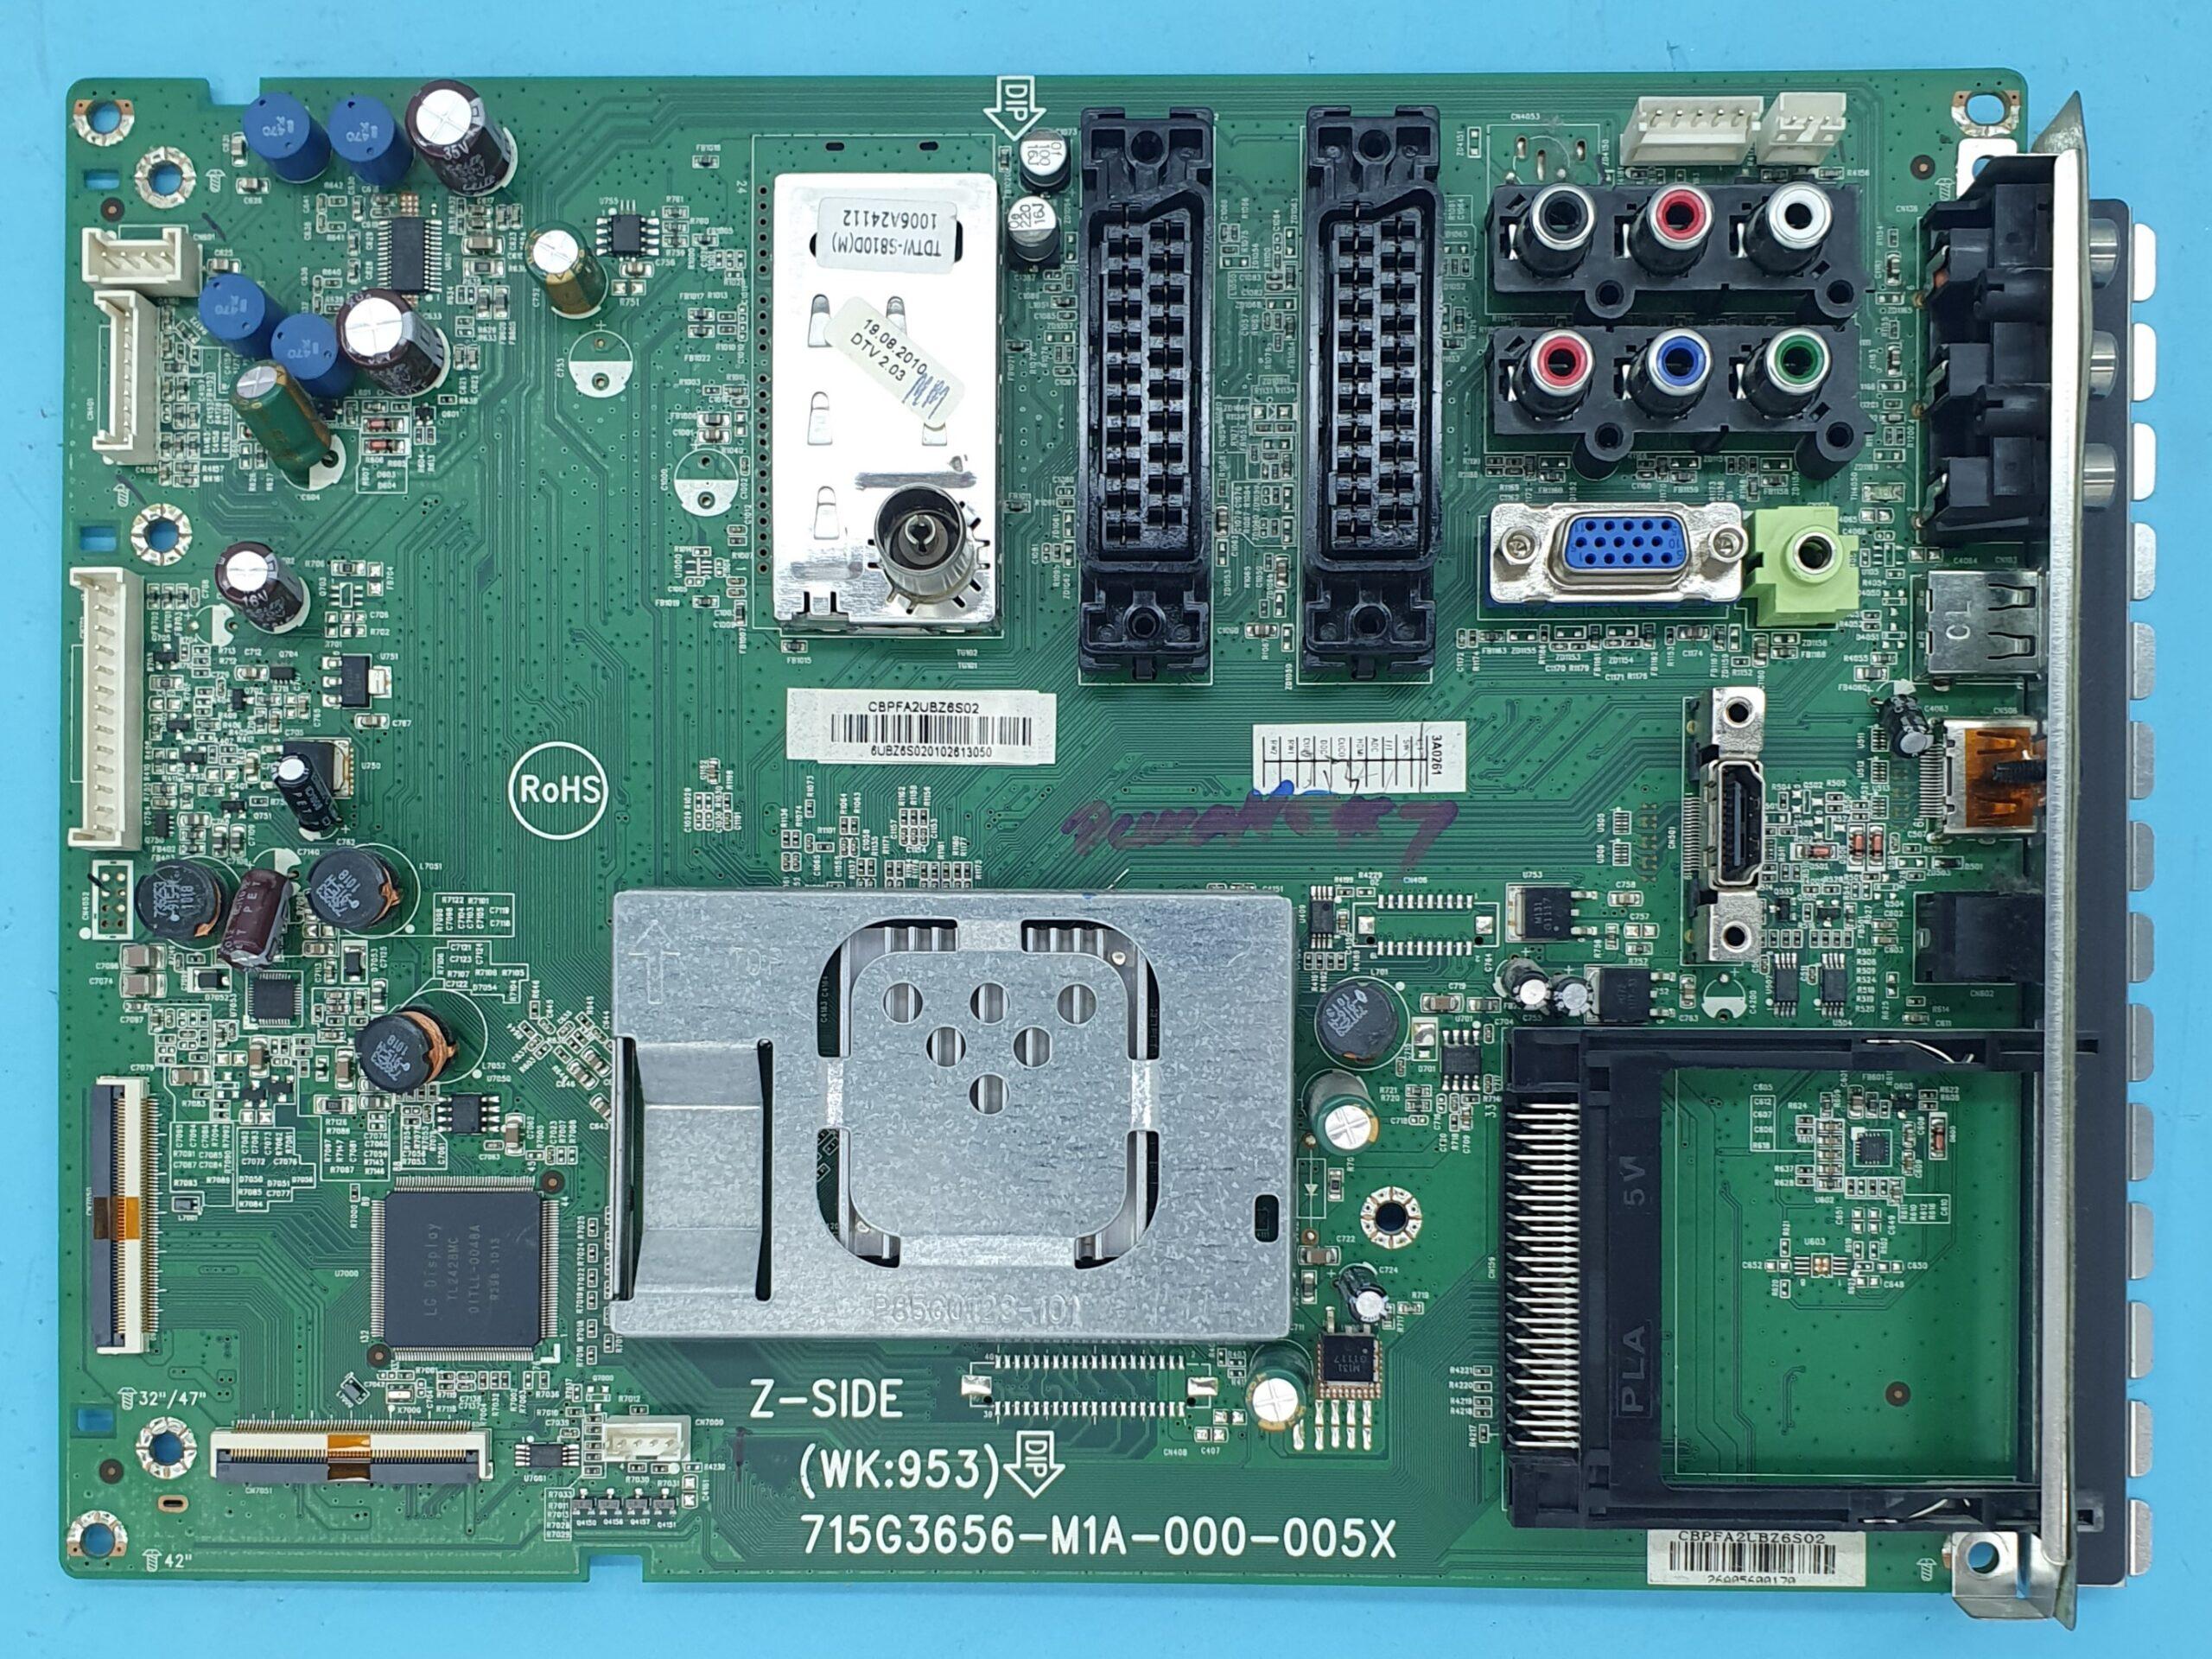 715G3656-M1A-000-005X Philips Anakart (KDV DAHİL = 236 TL)